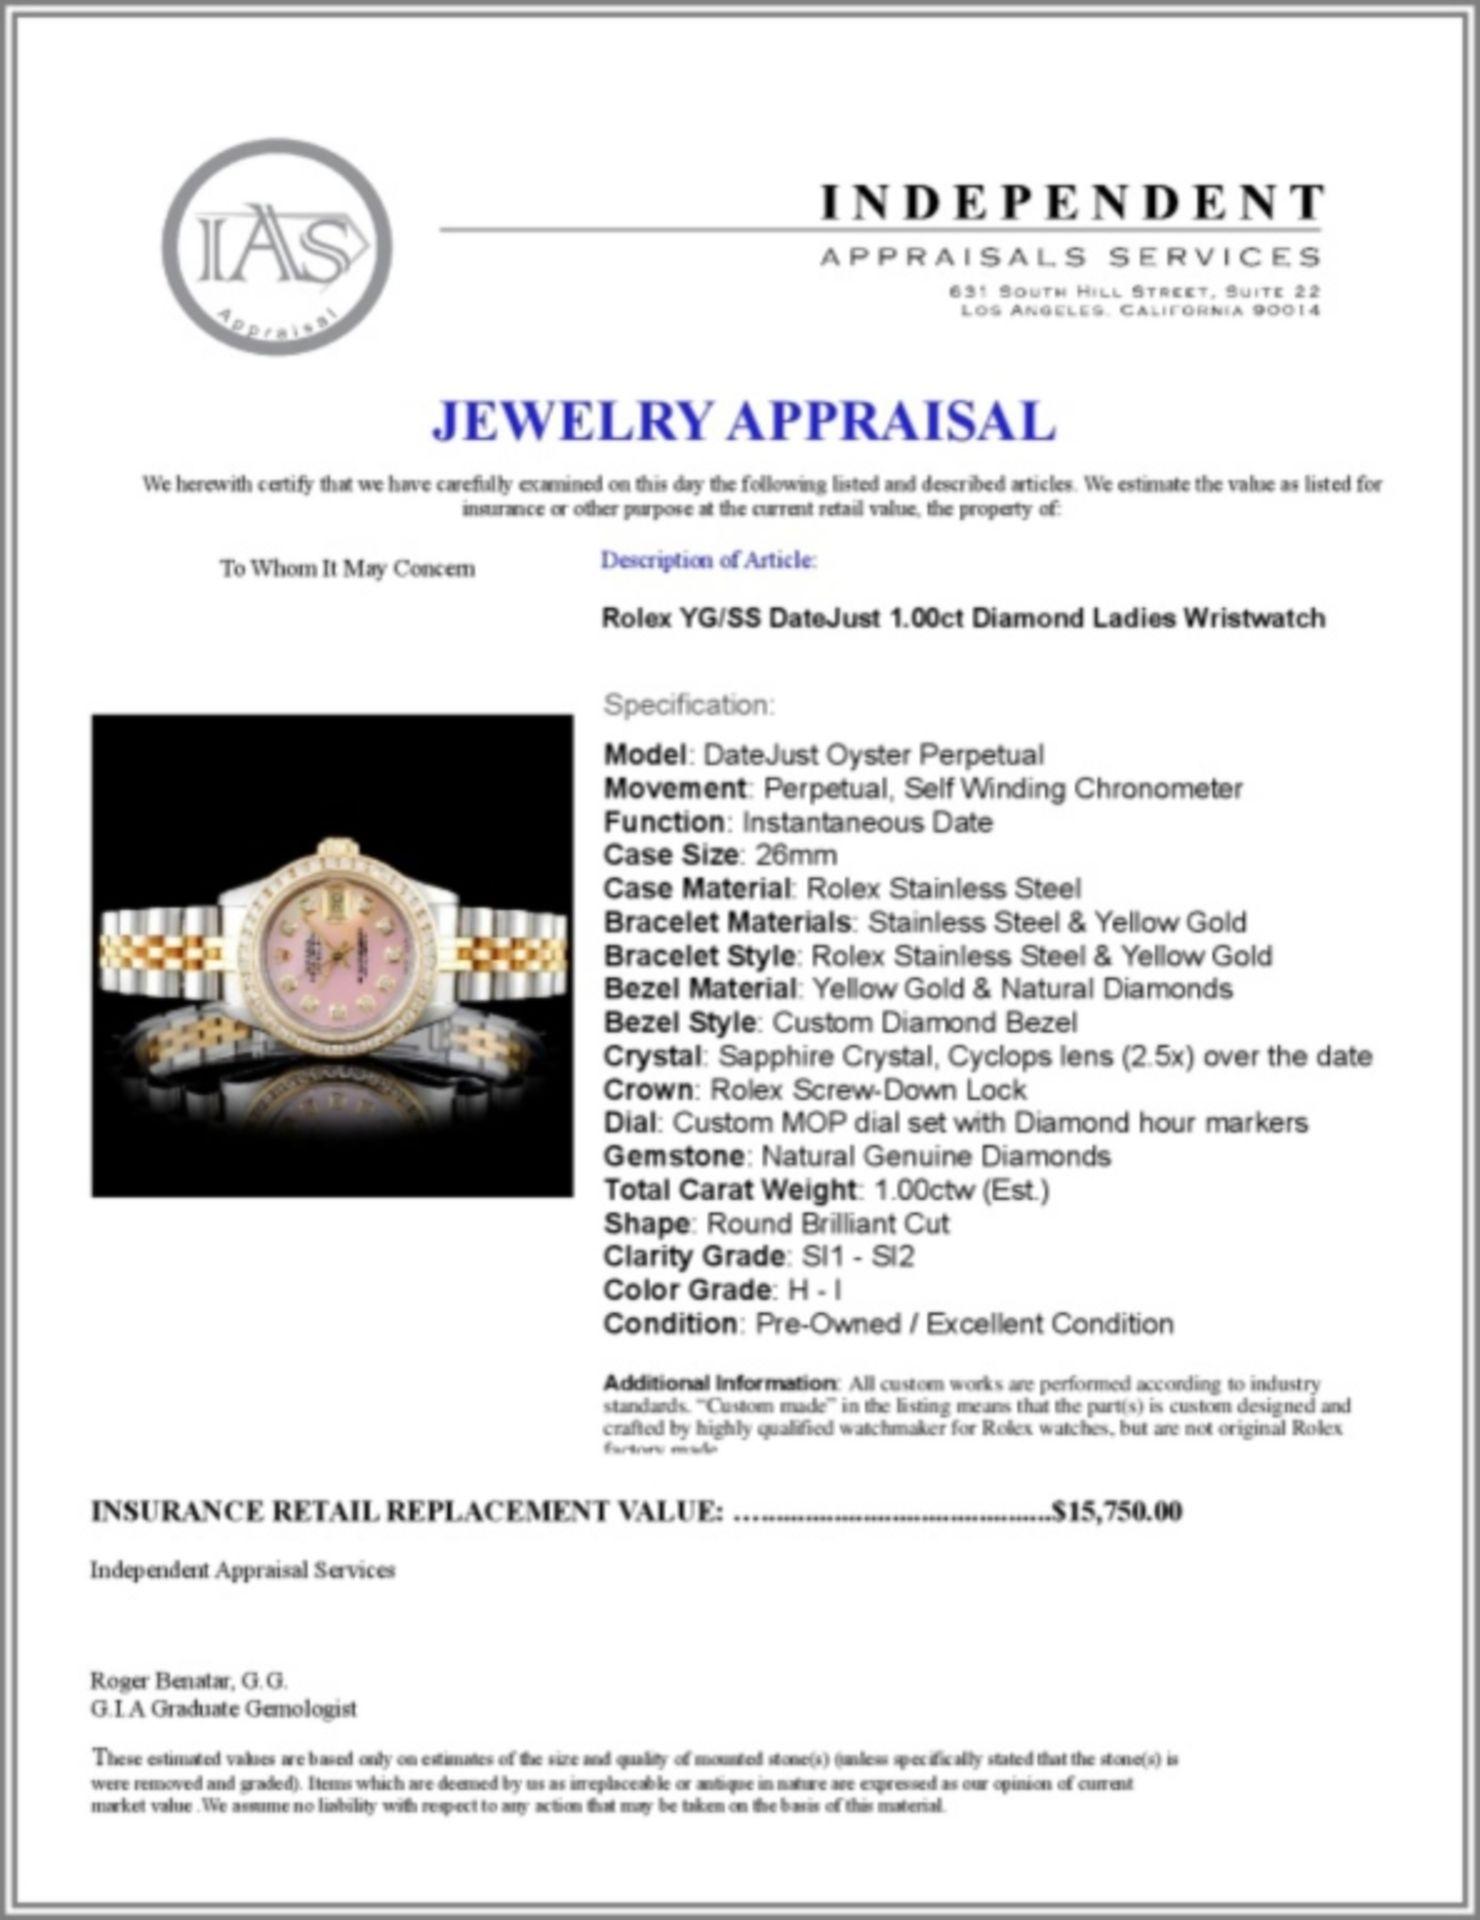 Rolex YG/SS DateJust Diamond Ladies Wristwa - Image 5 of 5